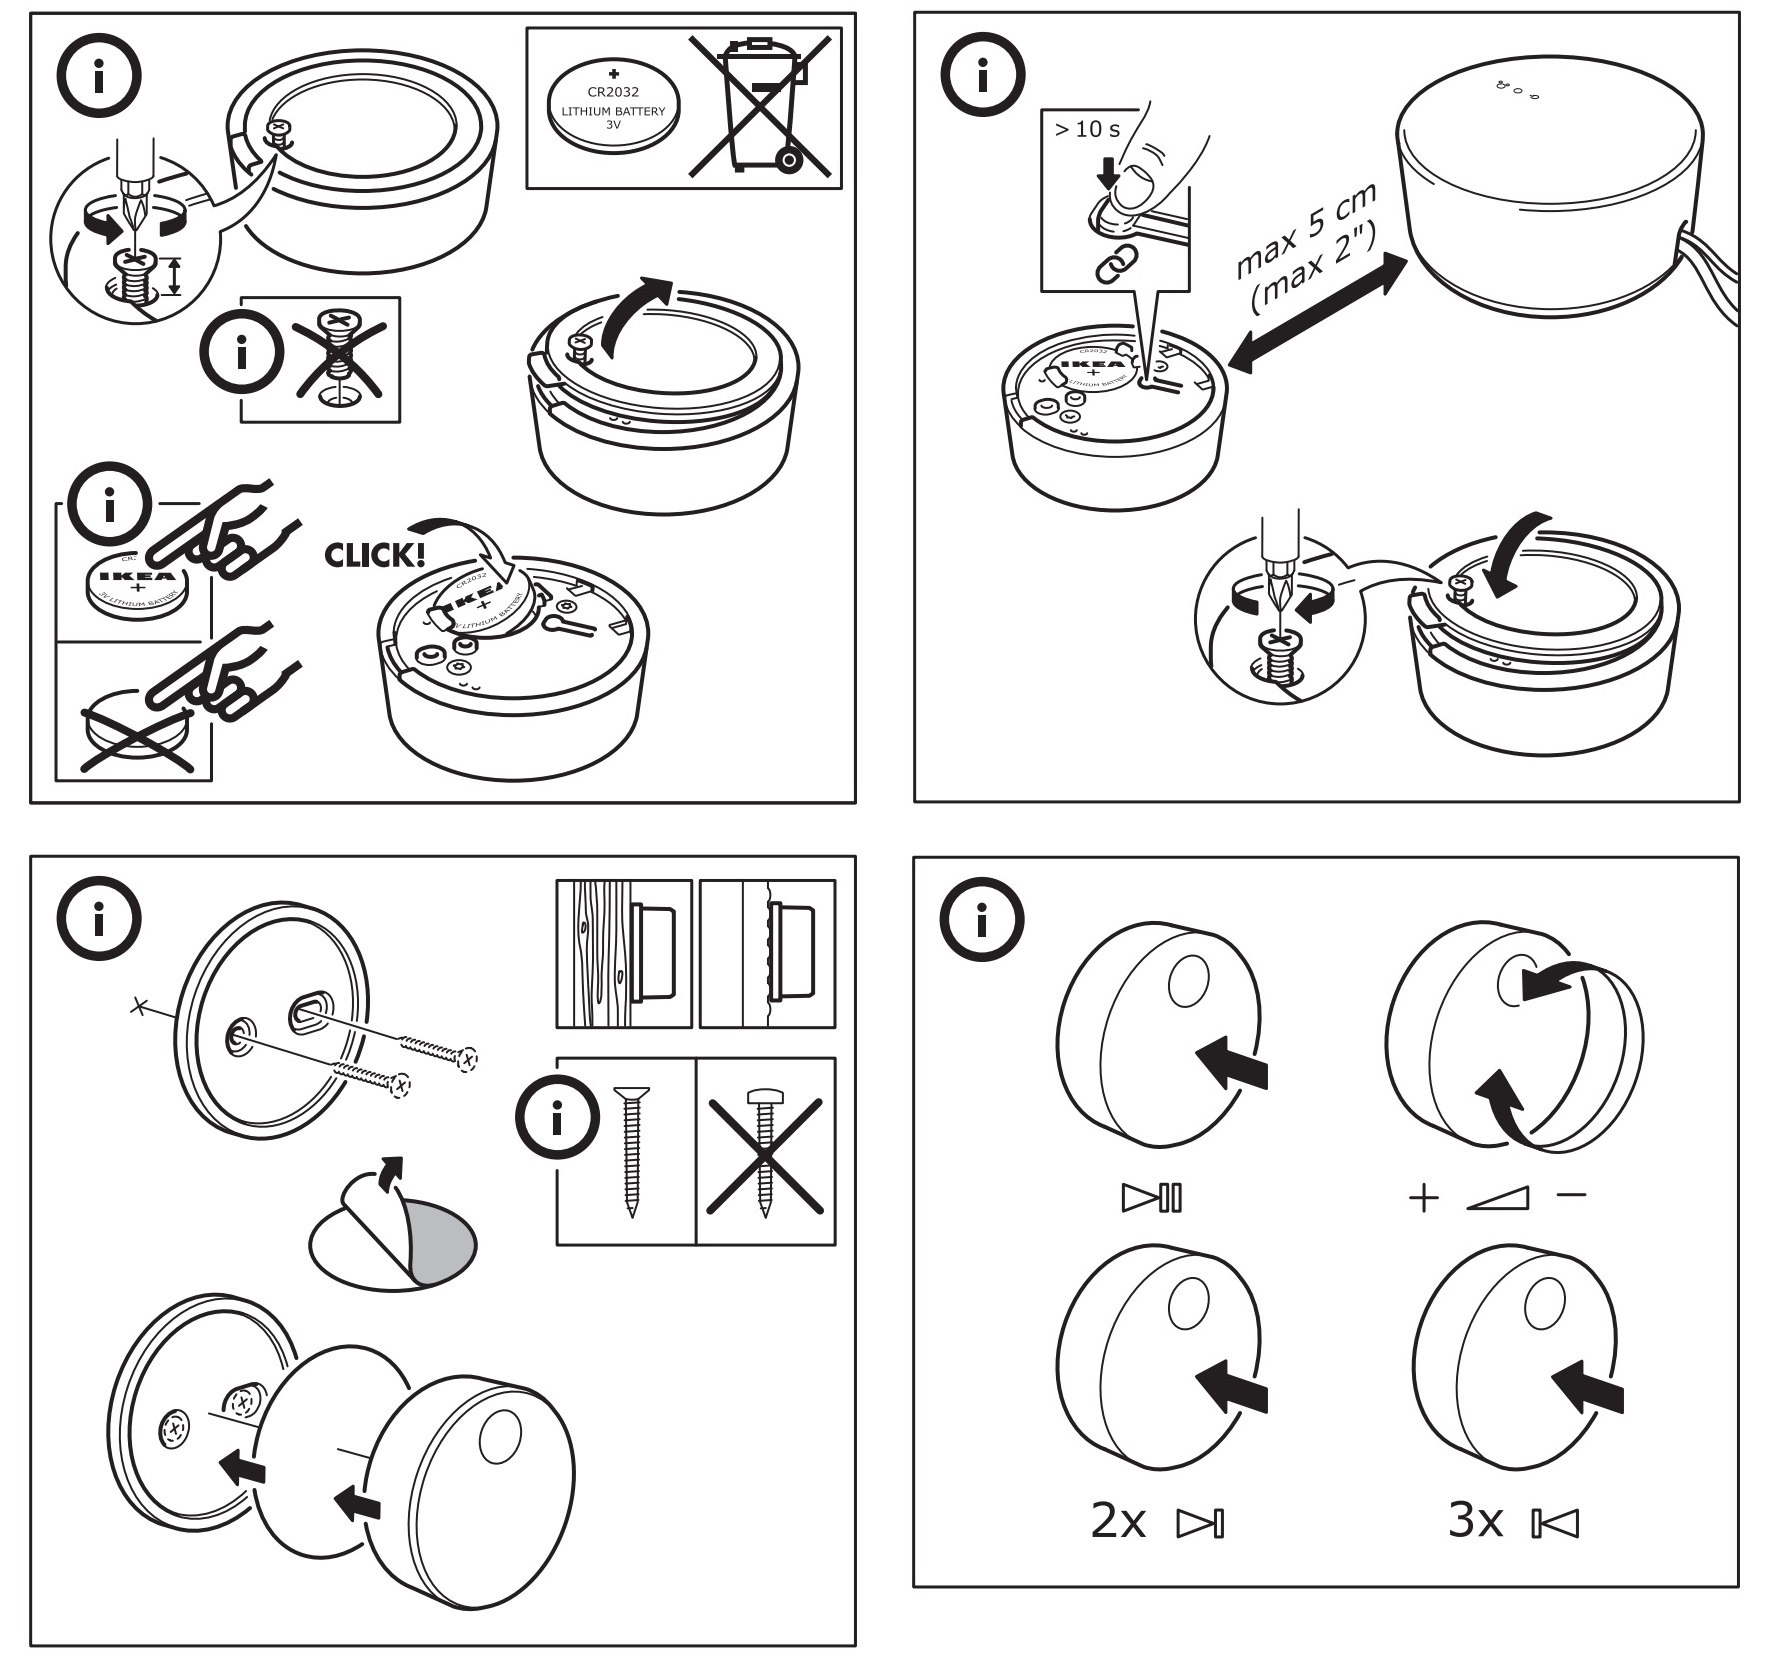 IKEA Symfonisk afstandbediening handleiding